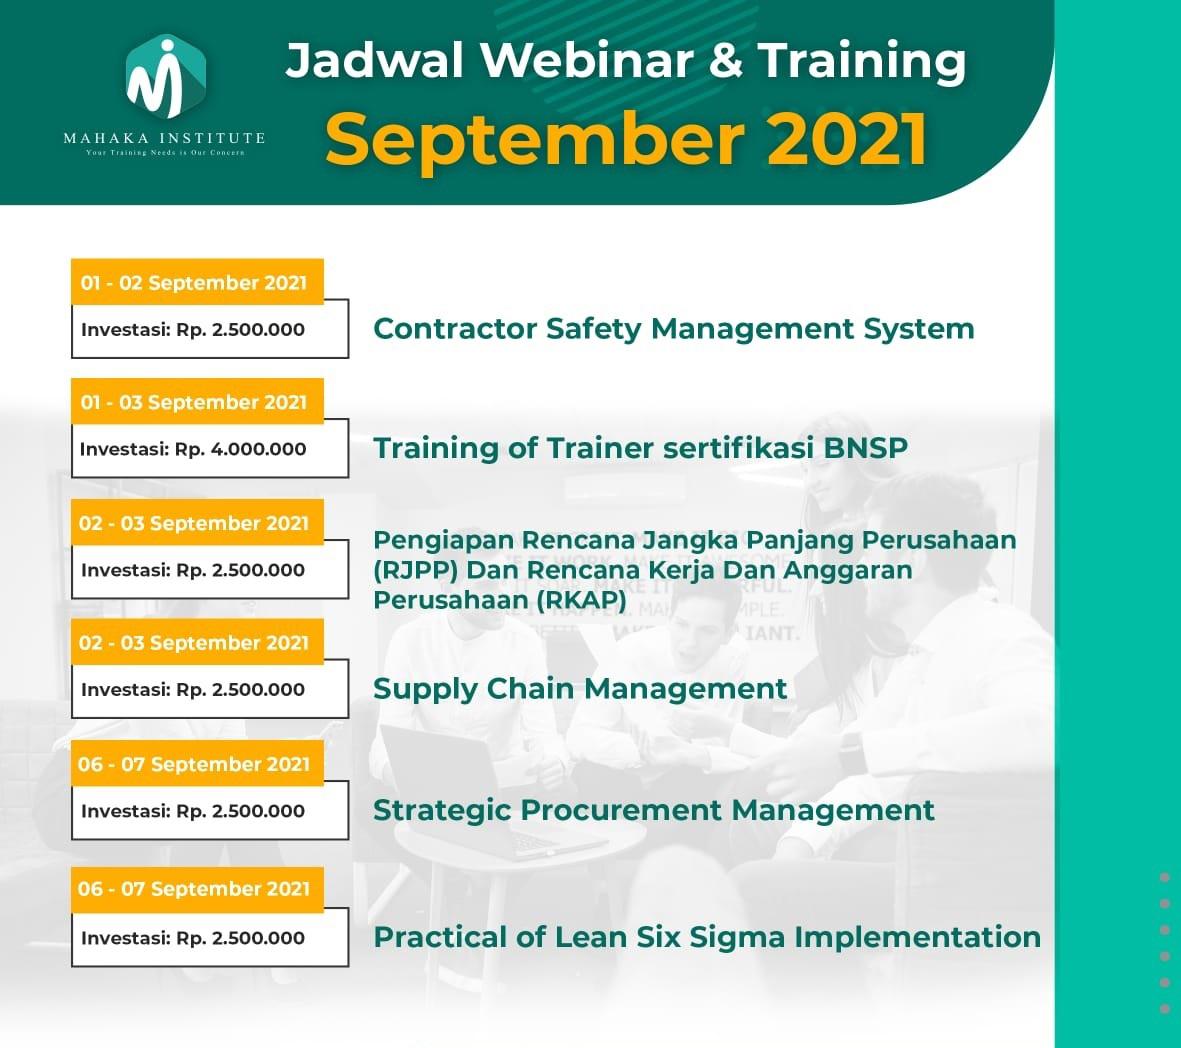 Jadwal Training Mahaka Agustus 2021 - 1